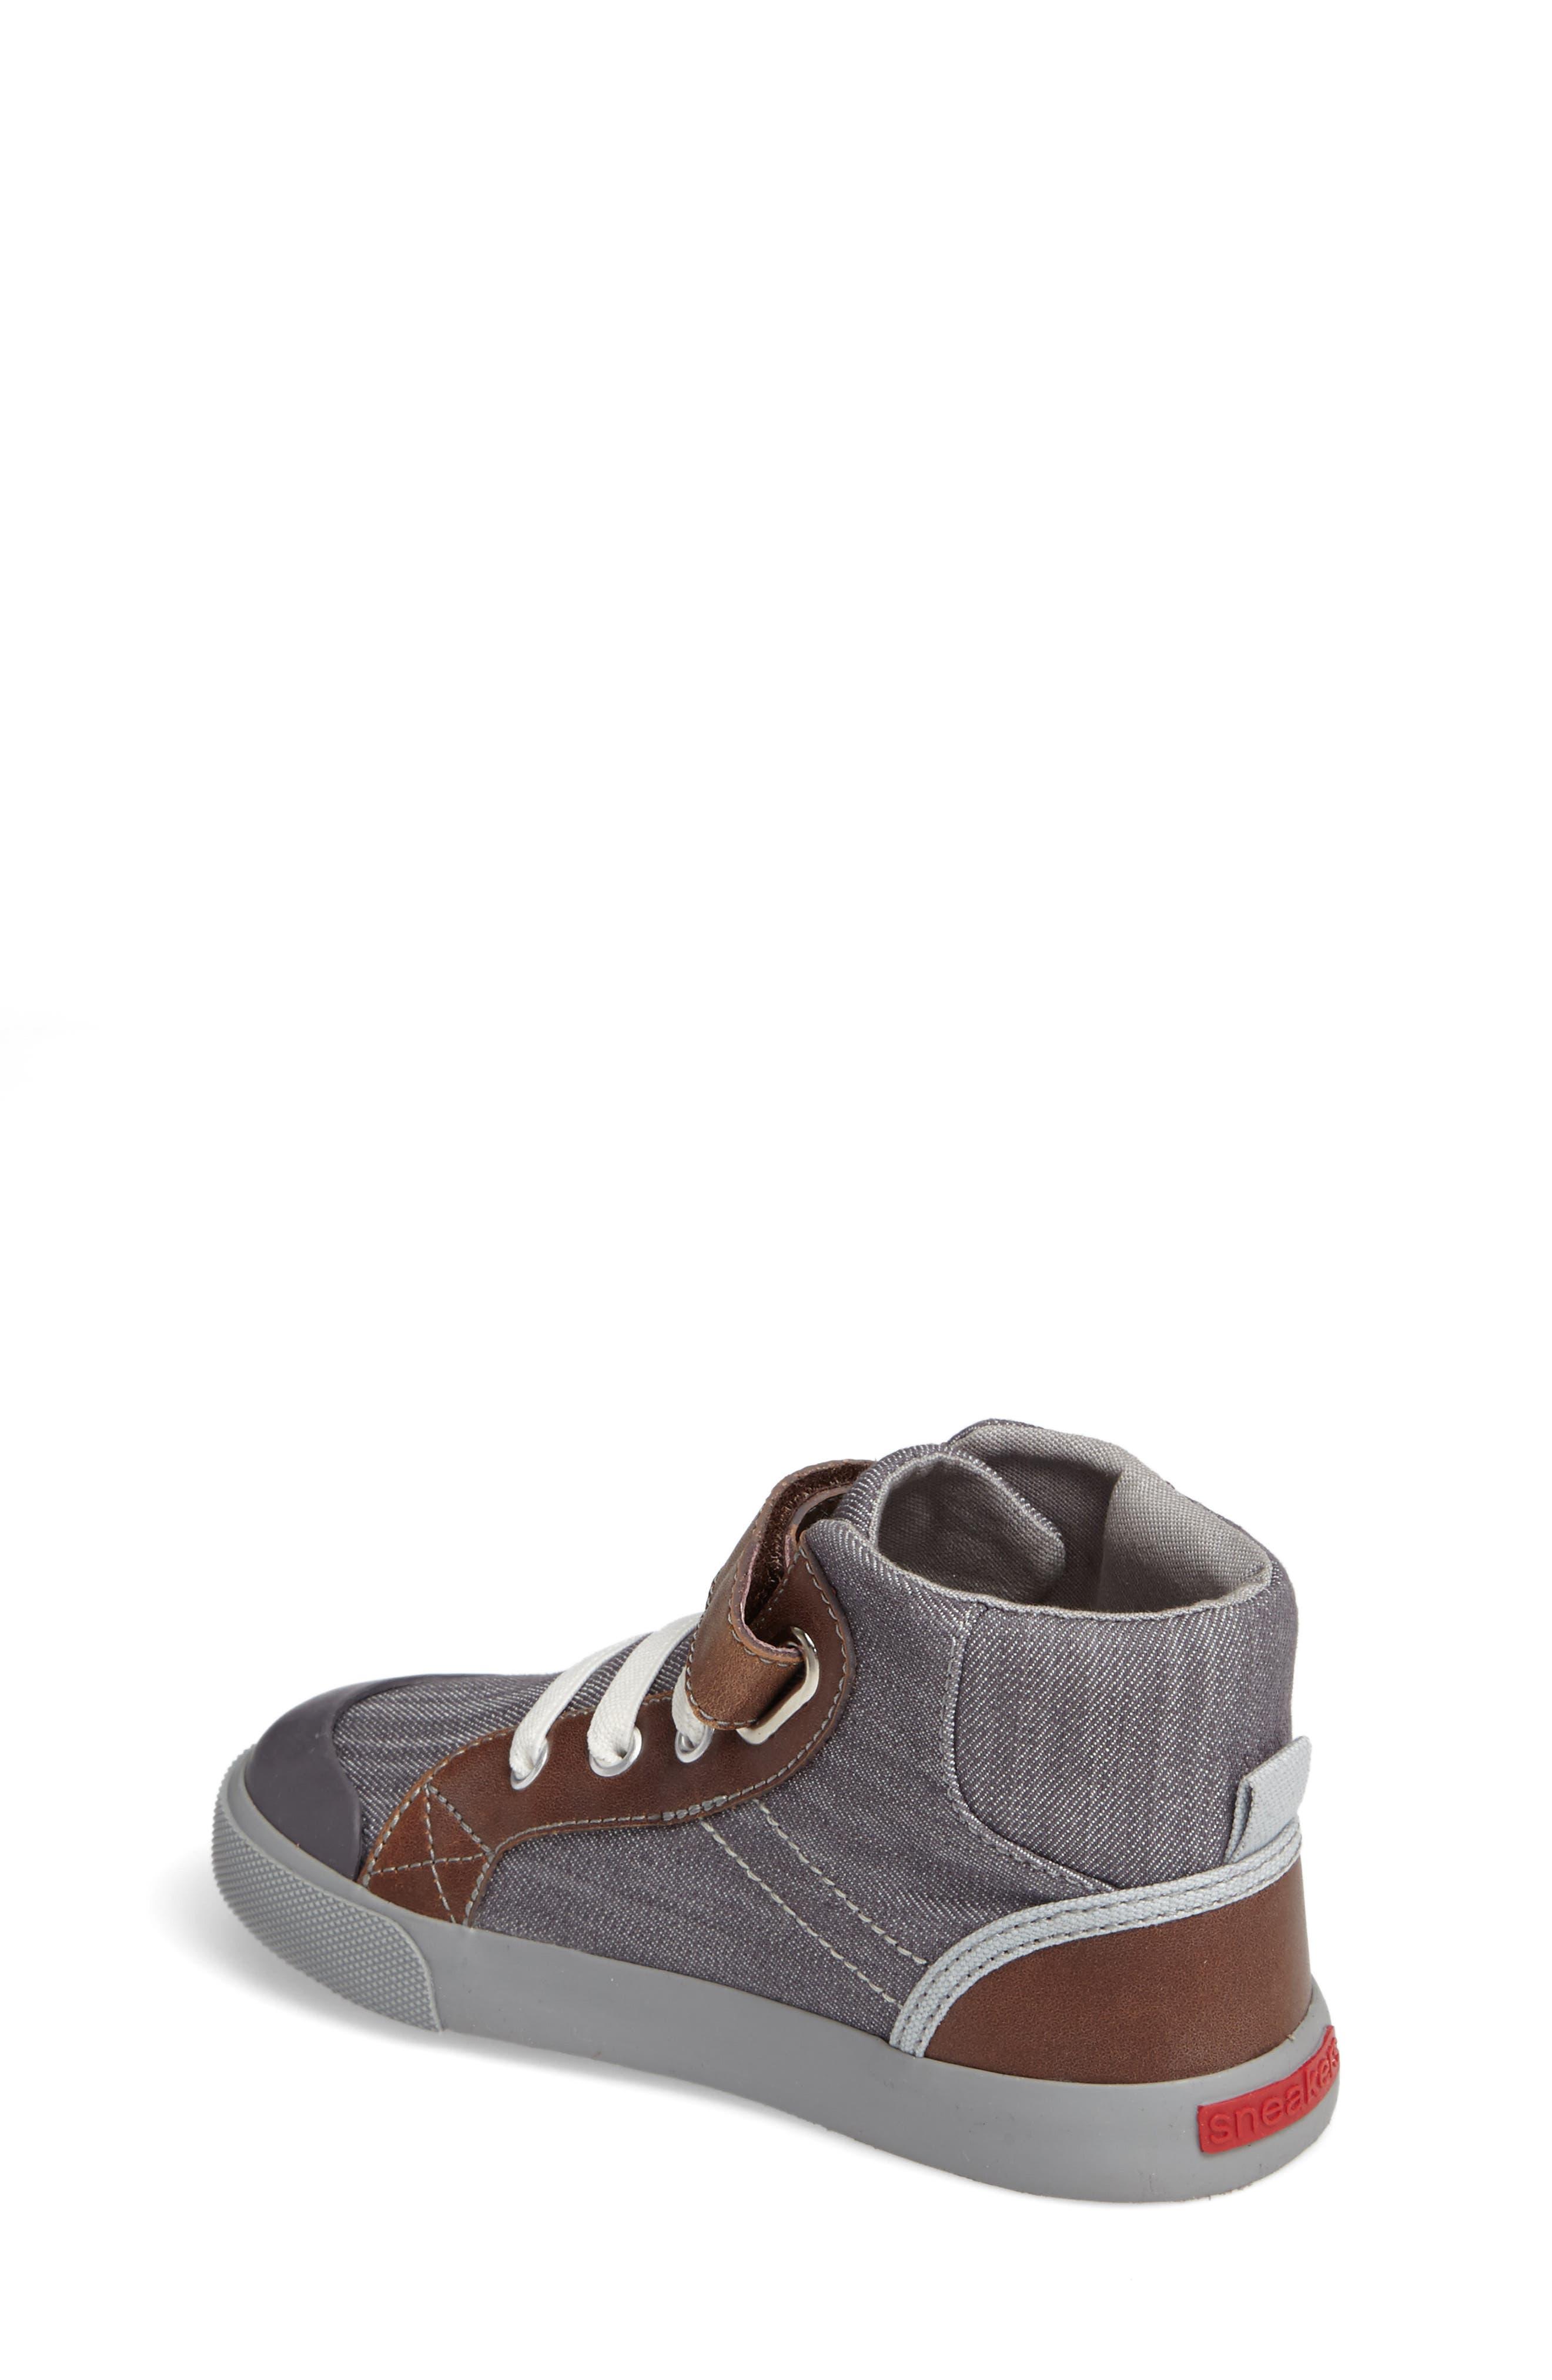 Alternate Image 2  - See Kai Run 'Dane' Sneaker (Baby, Walker & Toddler)